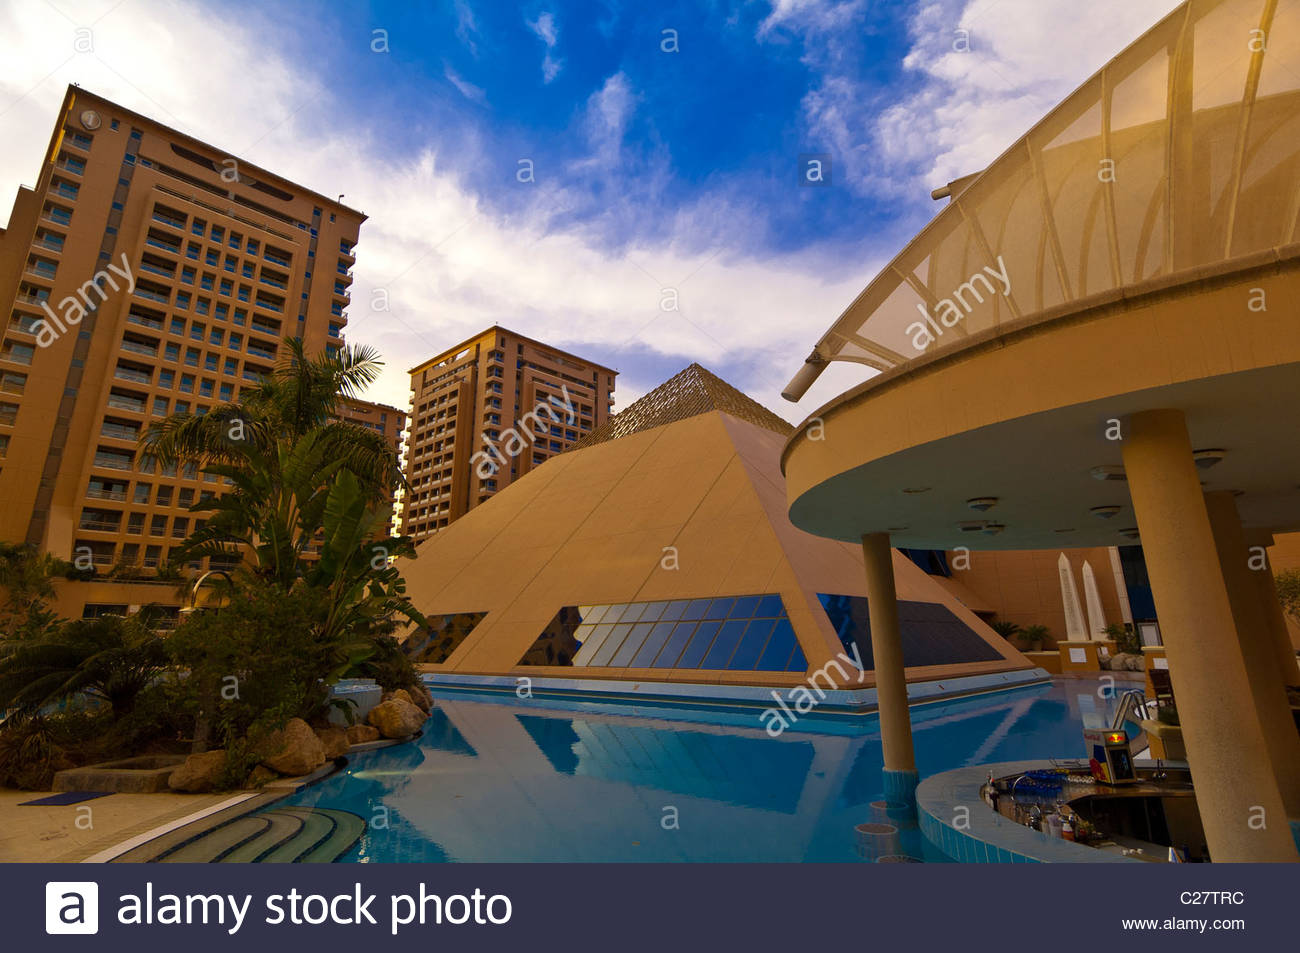 Swimming pool intercontinental cairo city stars hotel cairo egypt stock photo royalty free for Stars swimming pool tacloban city